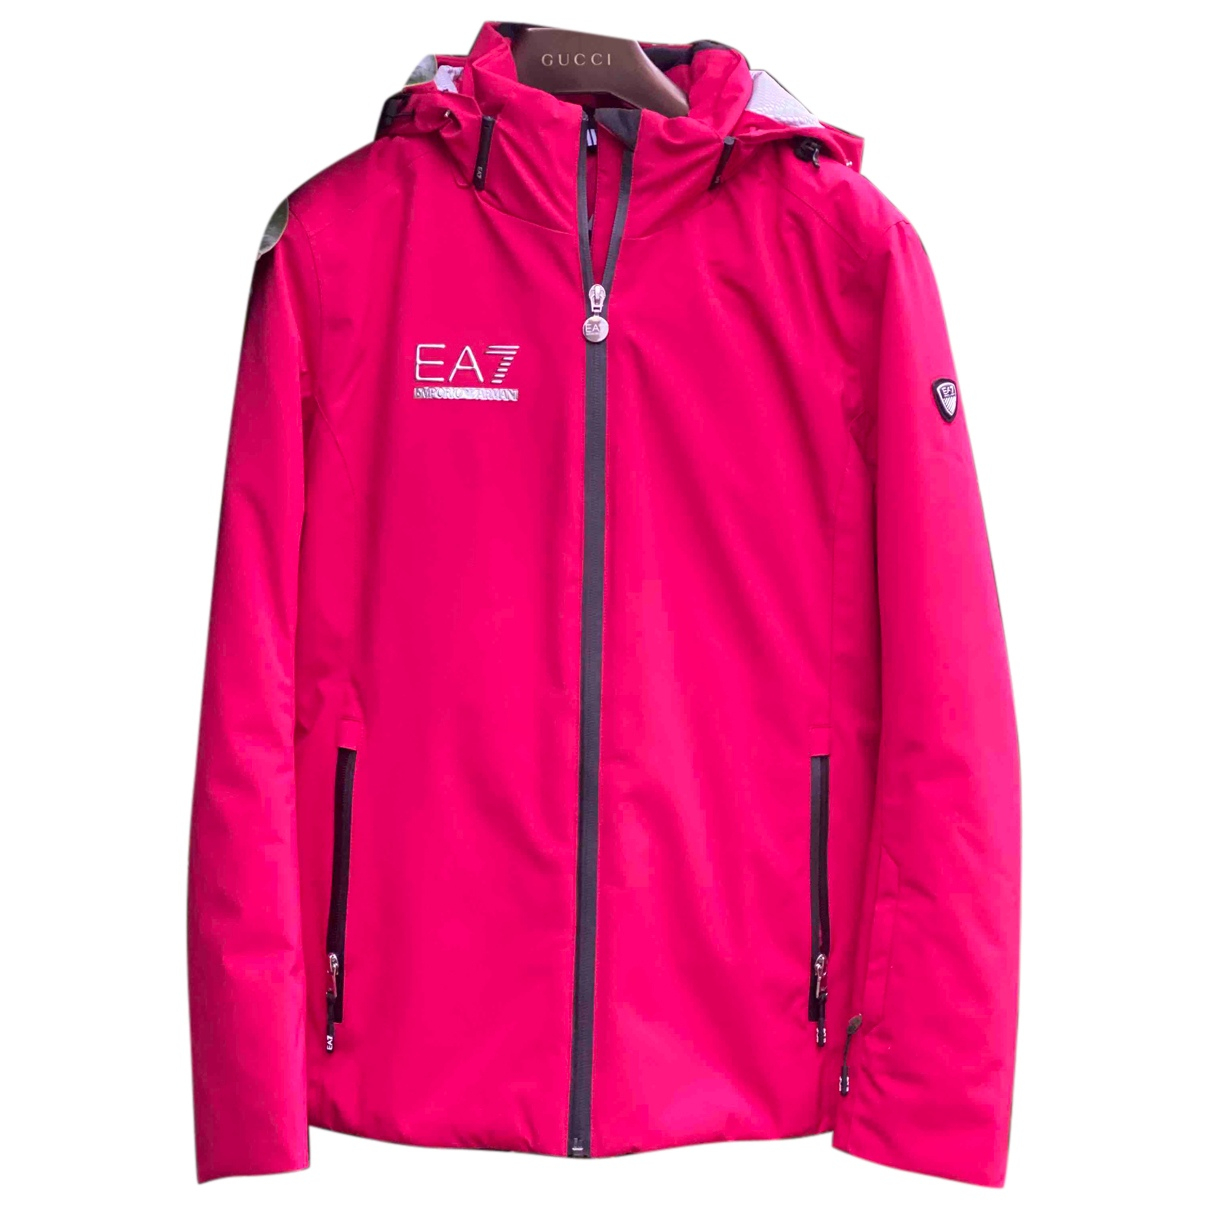 Emporio Armani N Pink jacket for Women L International